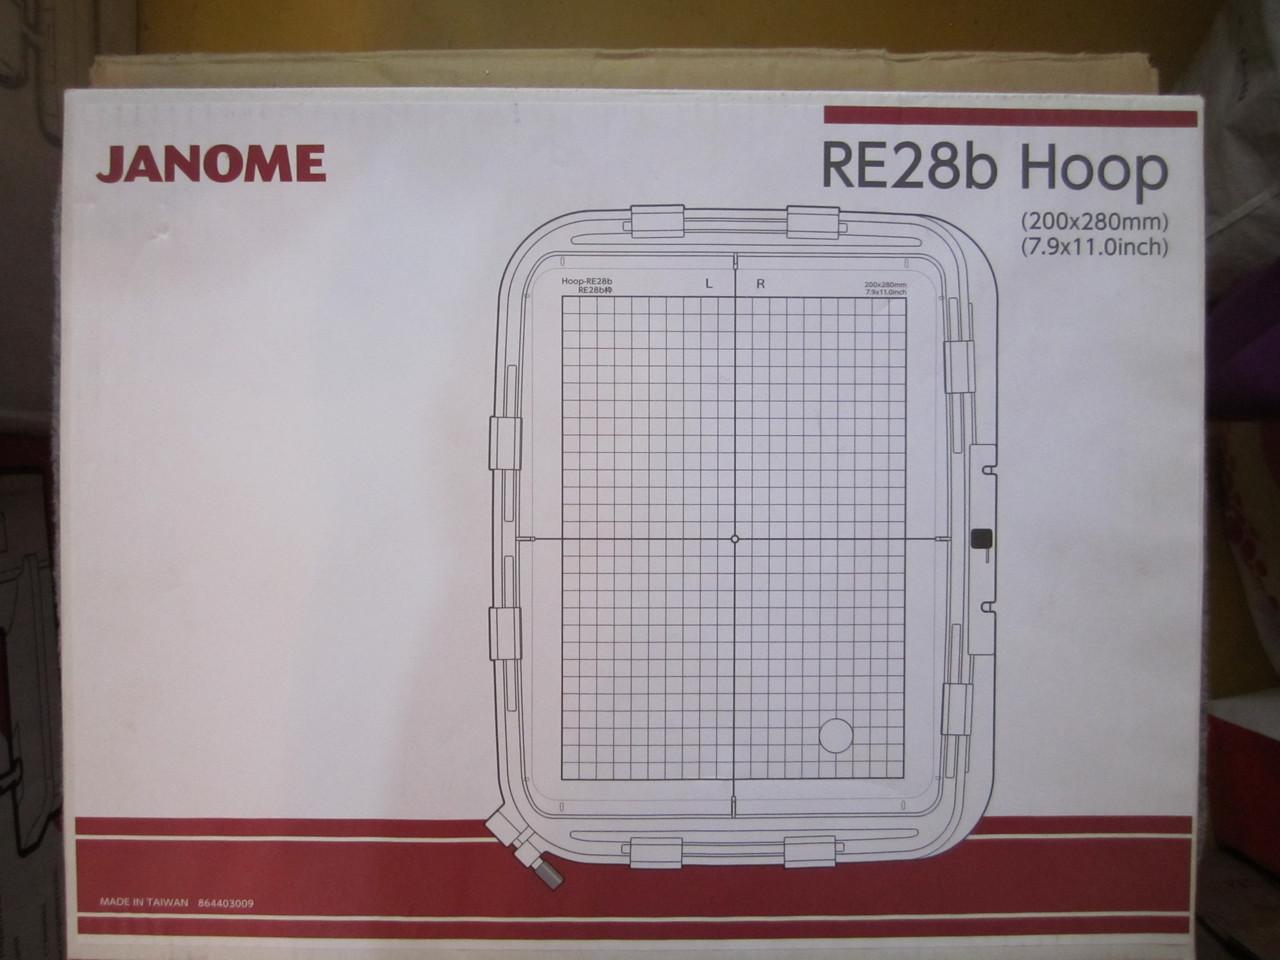 Пяльцы RE28b HOOP 200х280 для вышивальных машин Janome MC450 E , MC 500 Е  Elna Janome